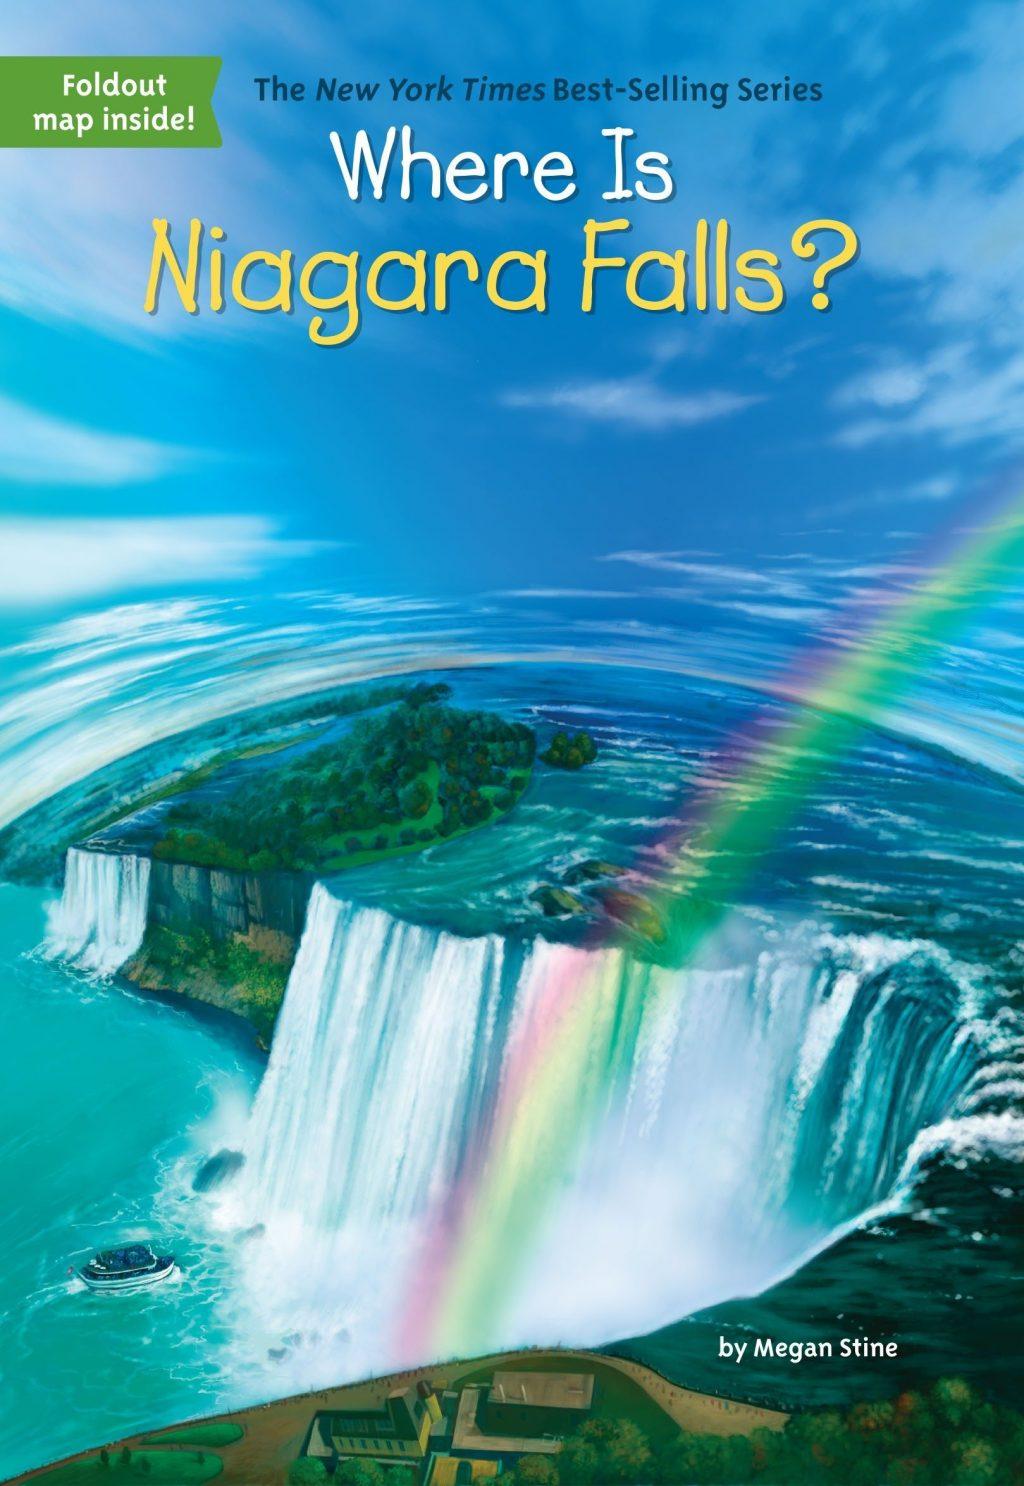 Distribuitor ap? = debite Niagara